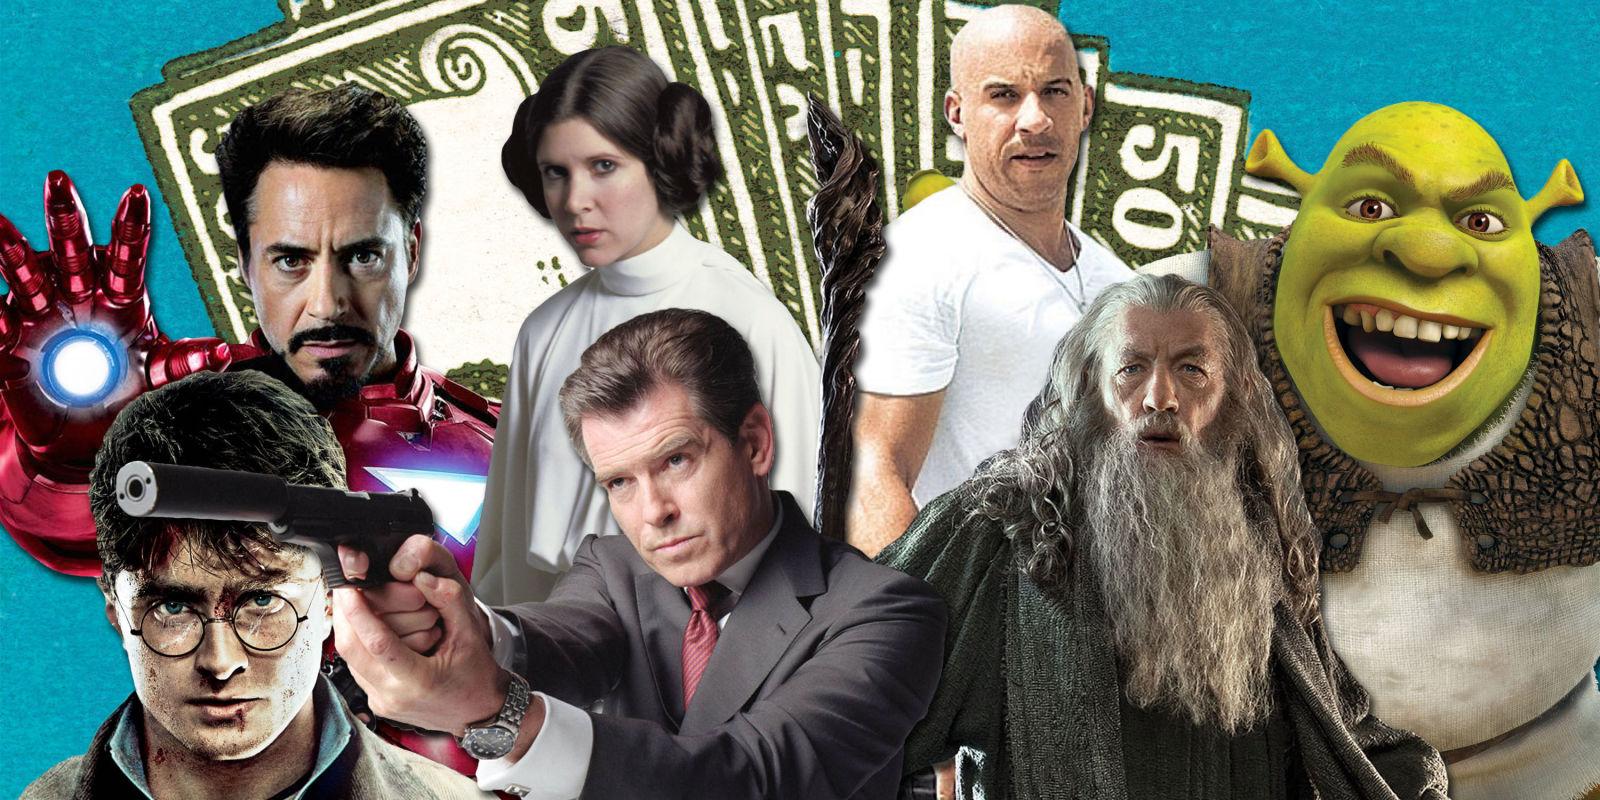 The Highest Grossing Film Franchises The 50 Biggest Film Series Ever